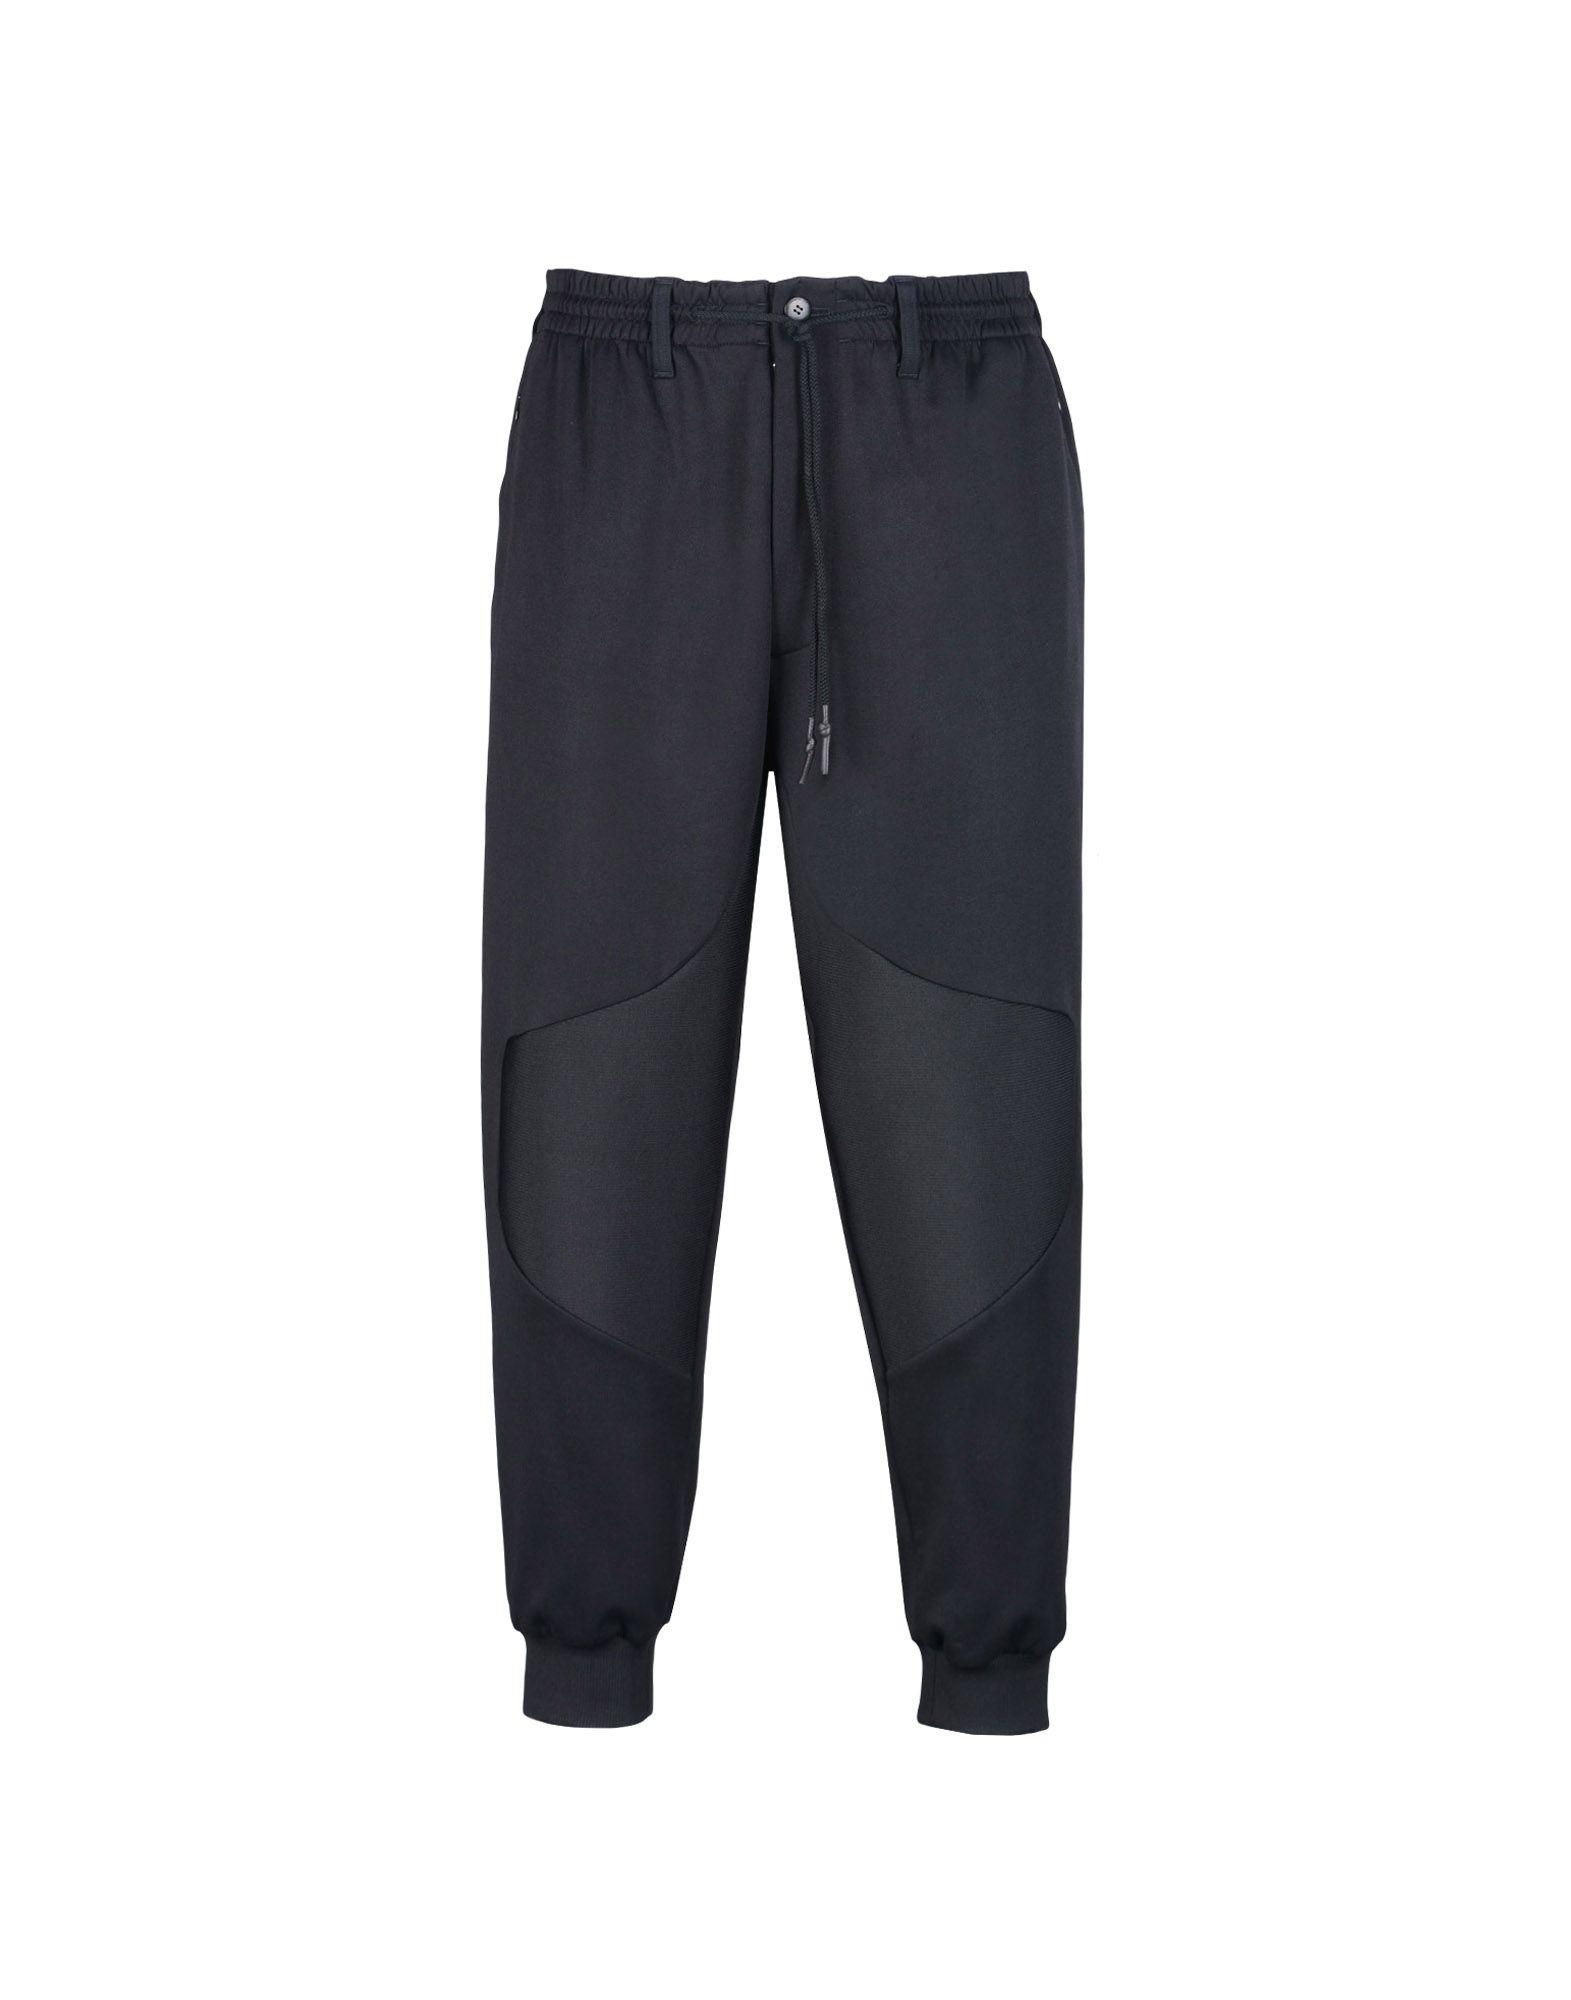 track pants y-3 core track pant pants man y-3 adidas xpjbnfz